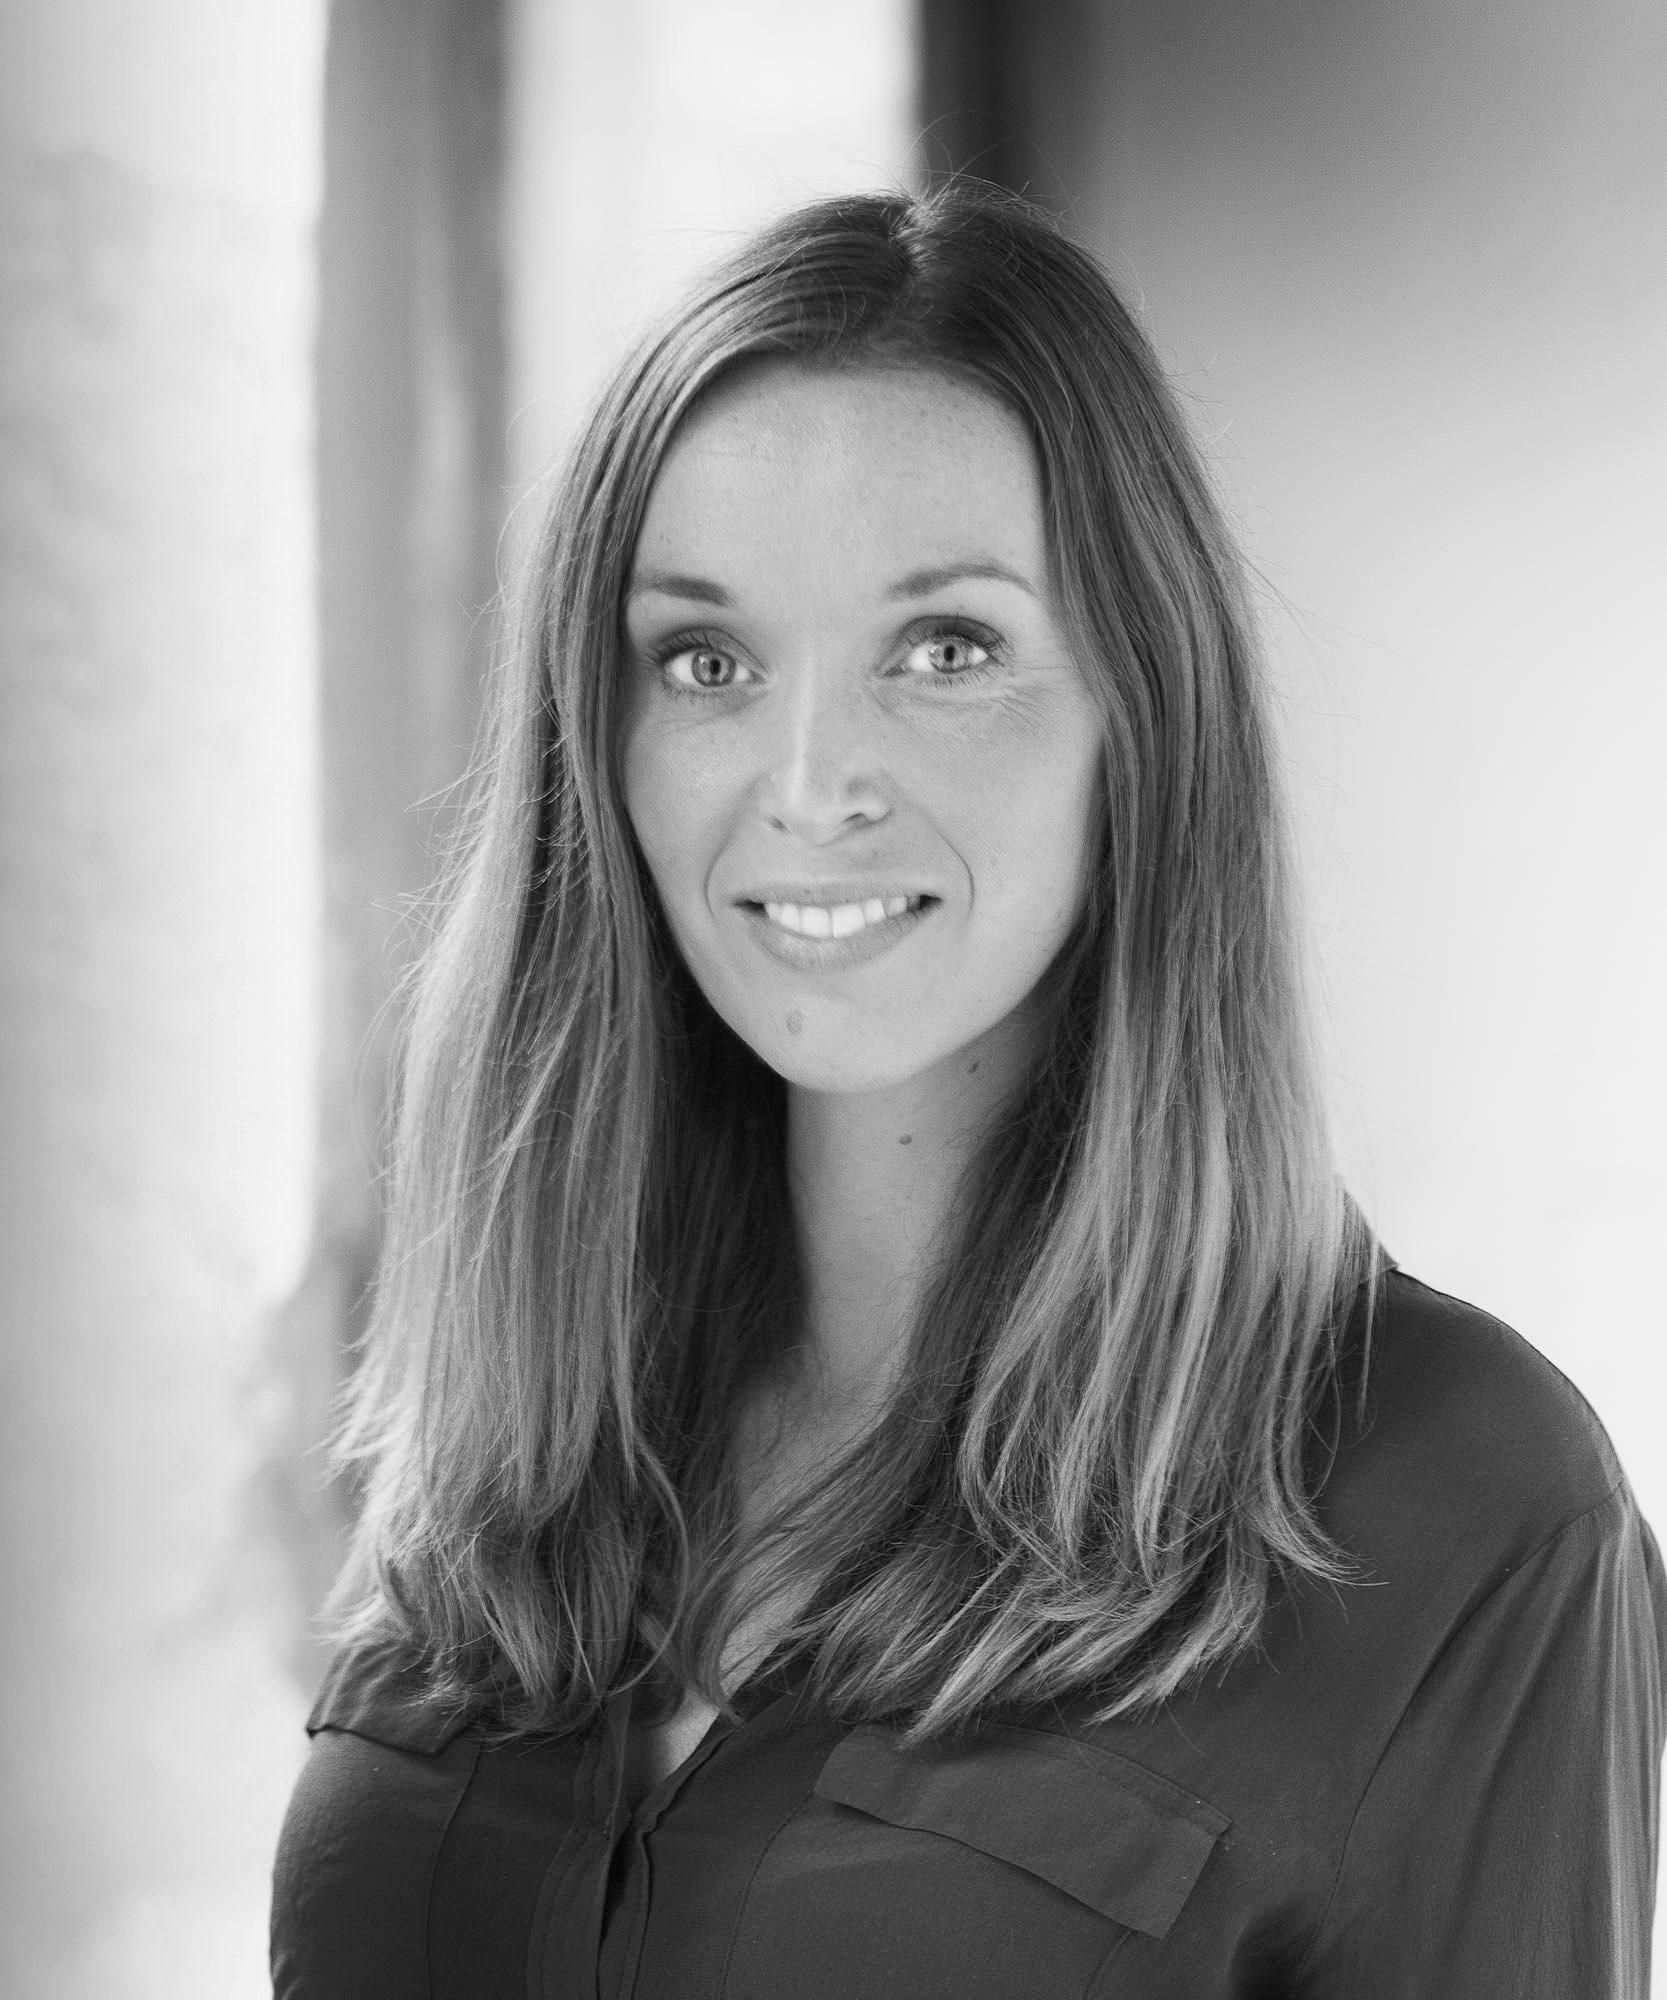 Mit navn er Karen Skovgaard Kvarning. Jeg har som privatpraktiserende psykolog min egen praksis i Herning midtby sammen med min mand, Alexander.